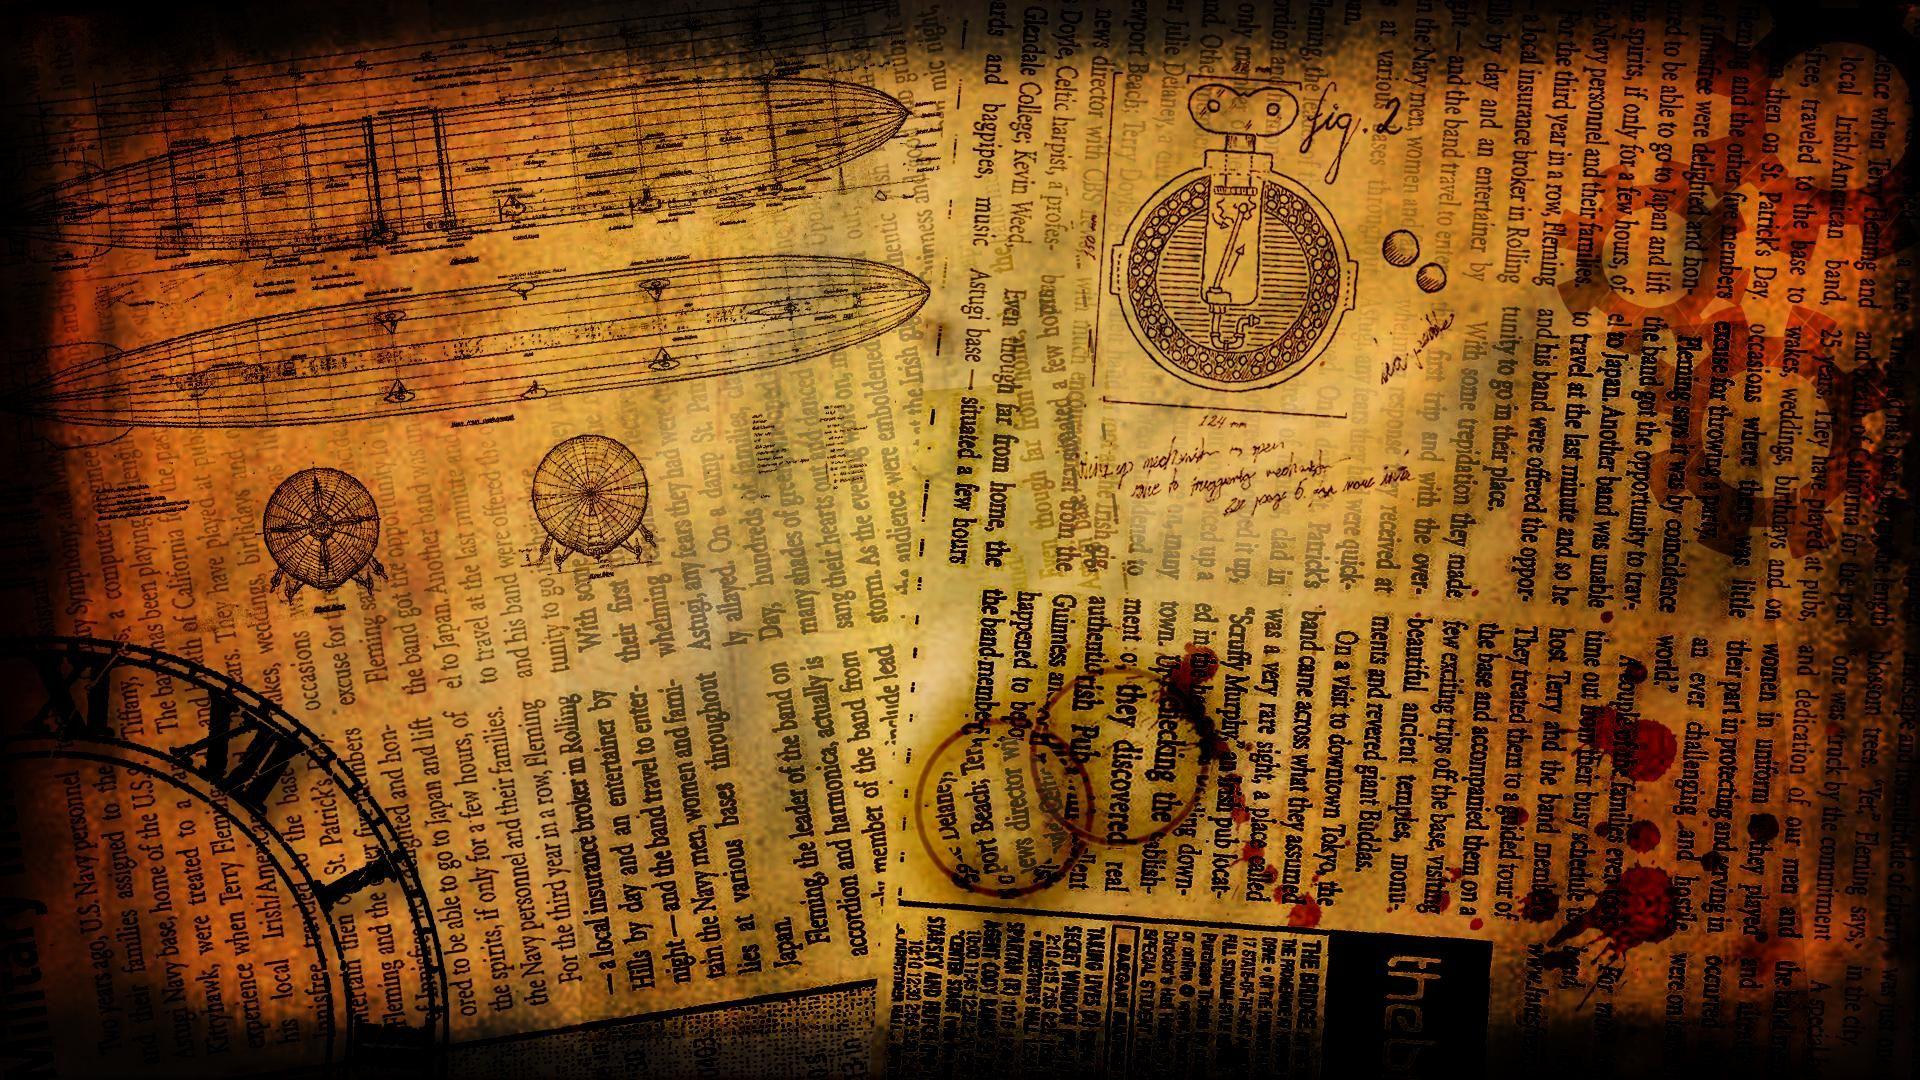 DeviantArt More Like Steampunk Wallpaper [1920x1080] by